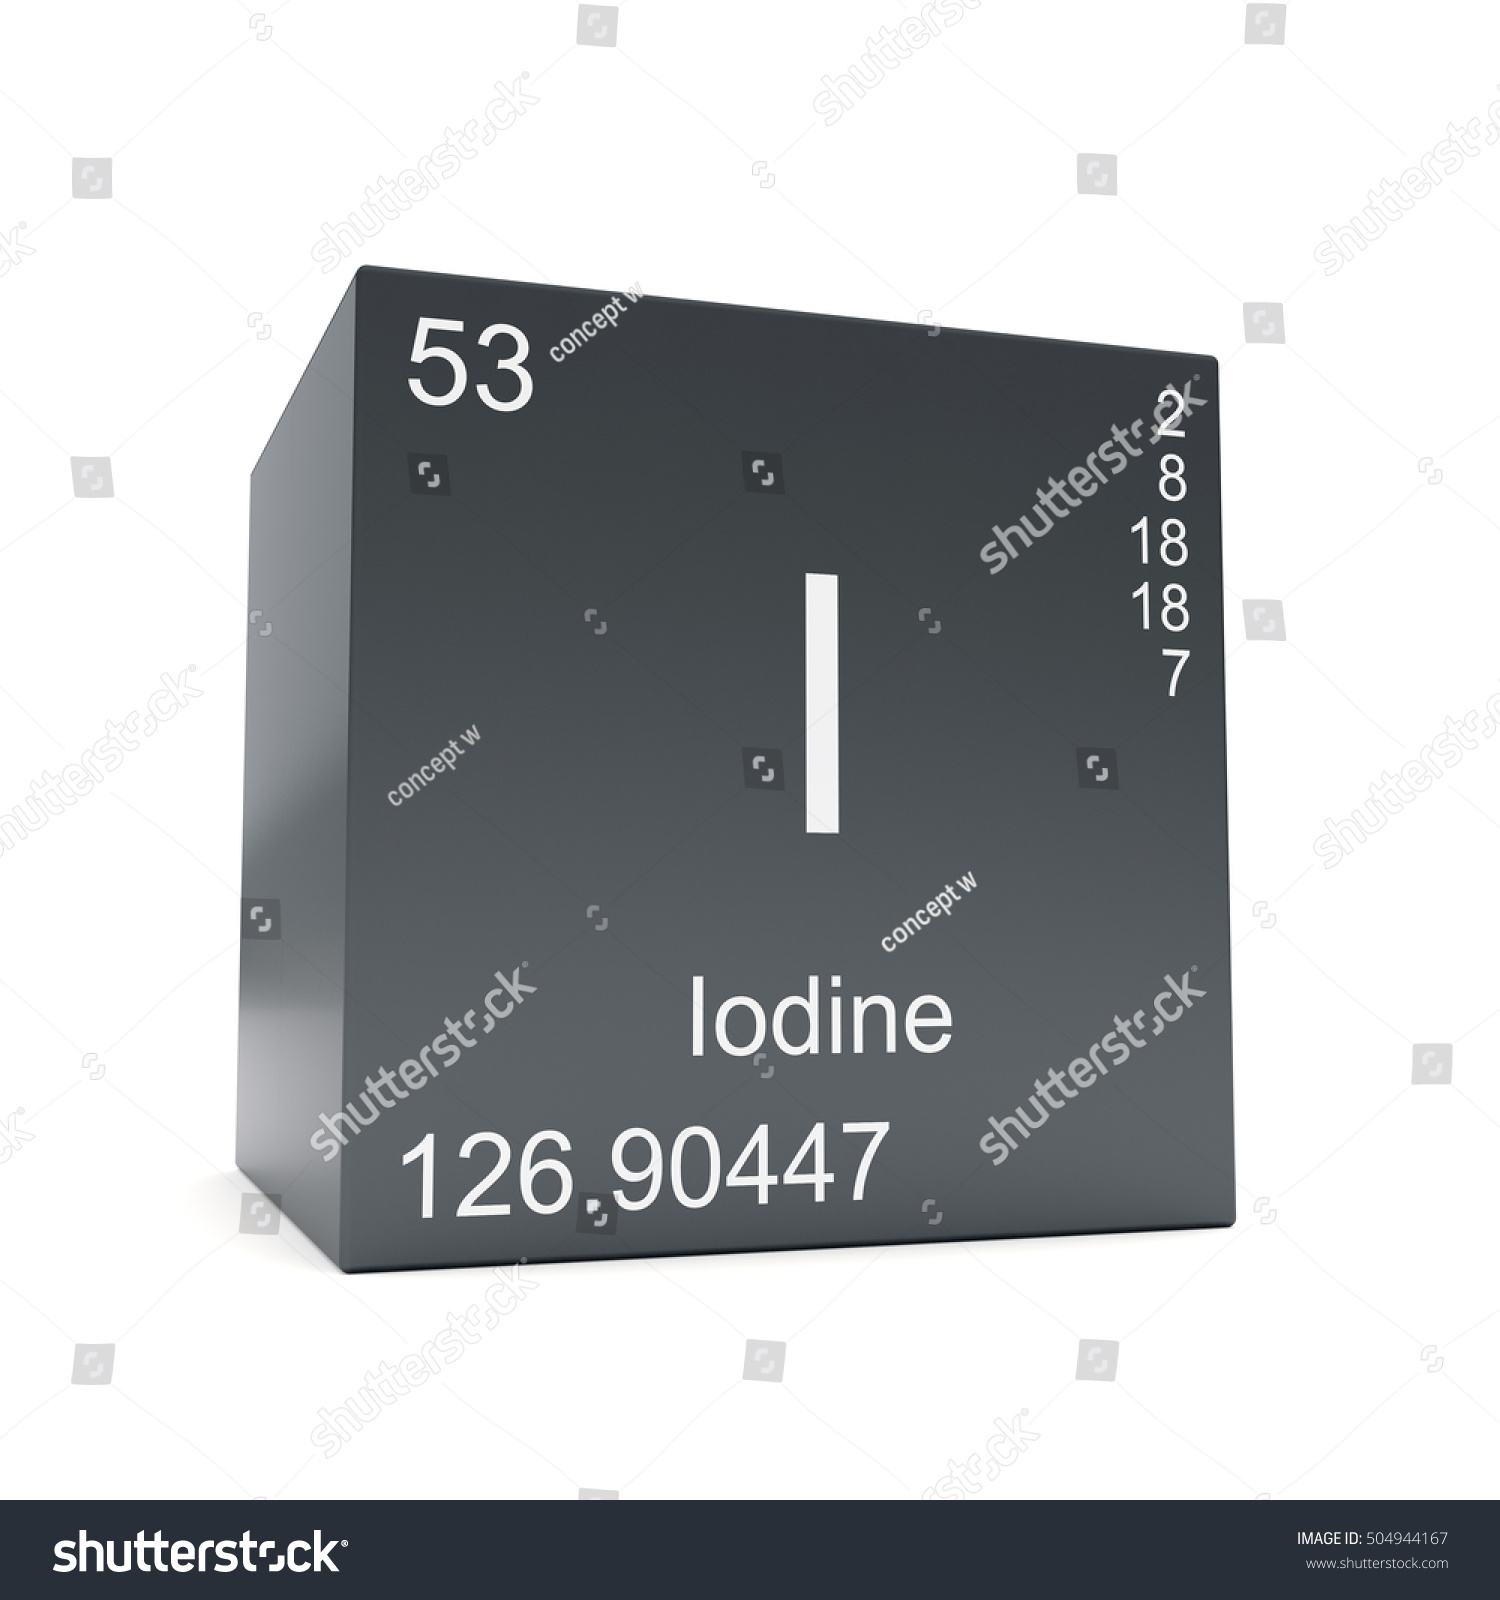 Iodine chemical element symbol periodic table stock illustration iodine chemical element symbol periodic table stock illustration 504944167 shutterstock urtaz Choice Image